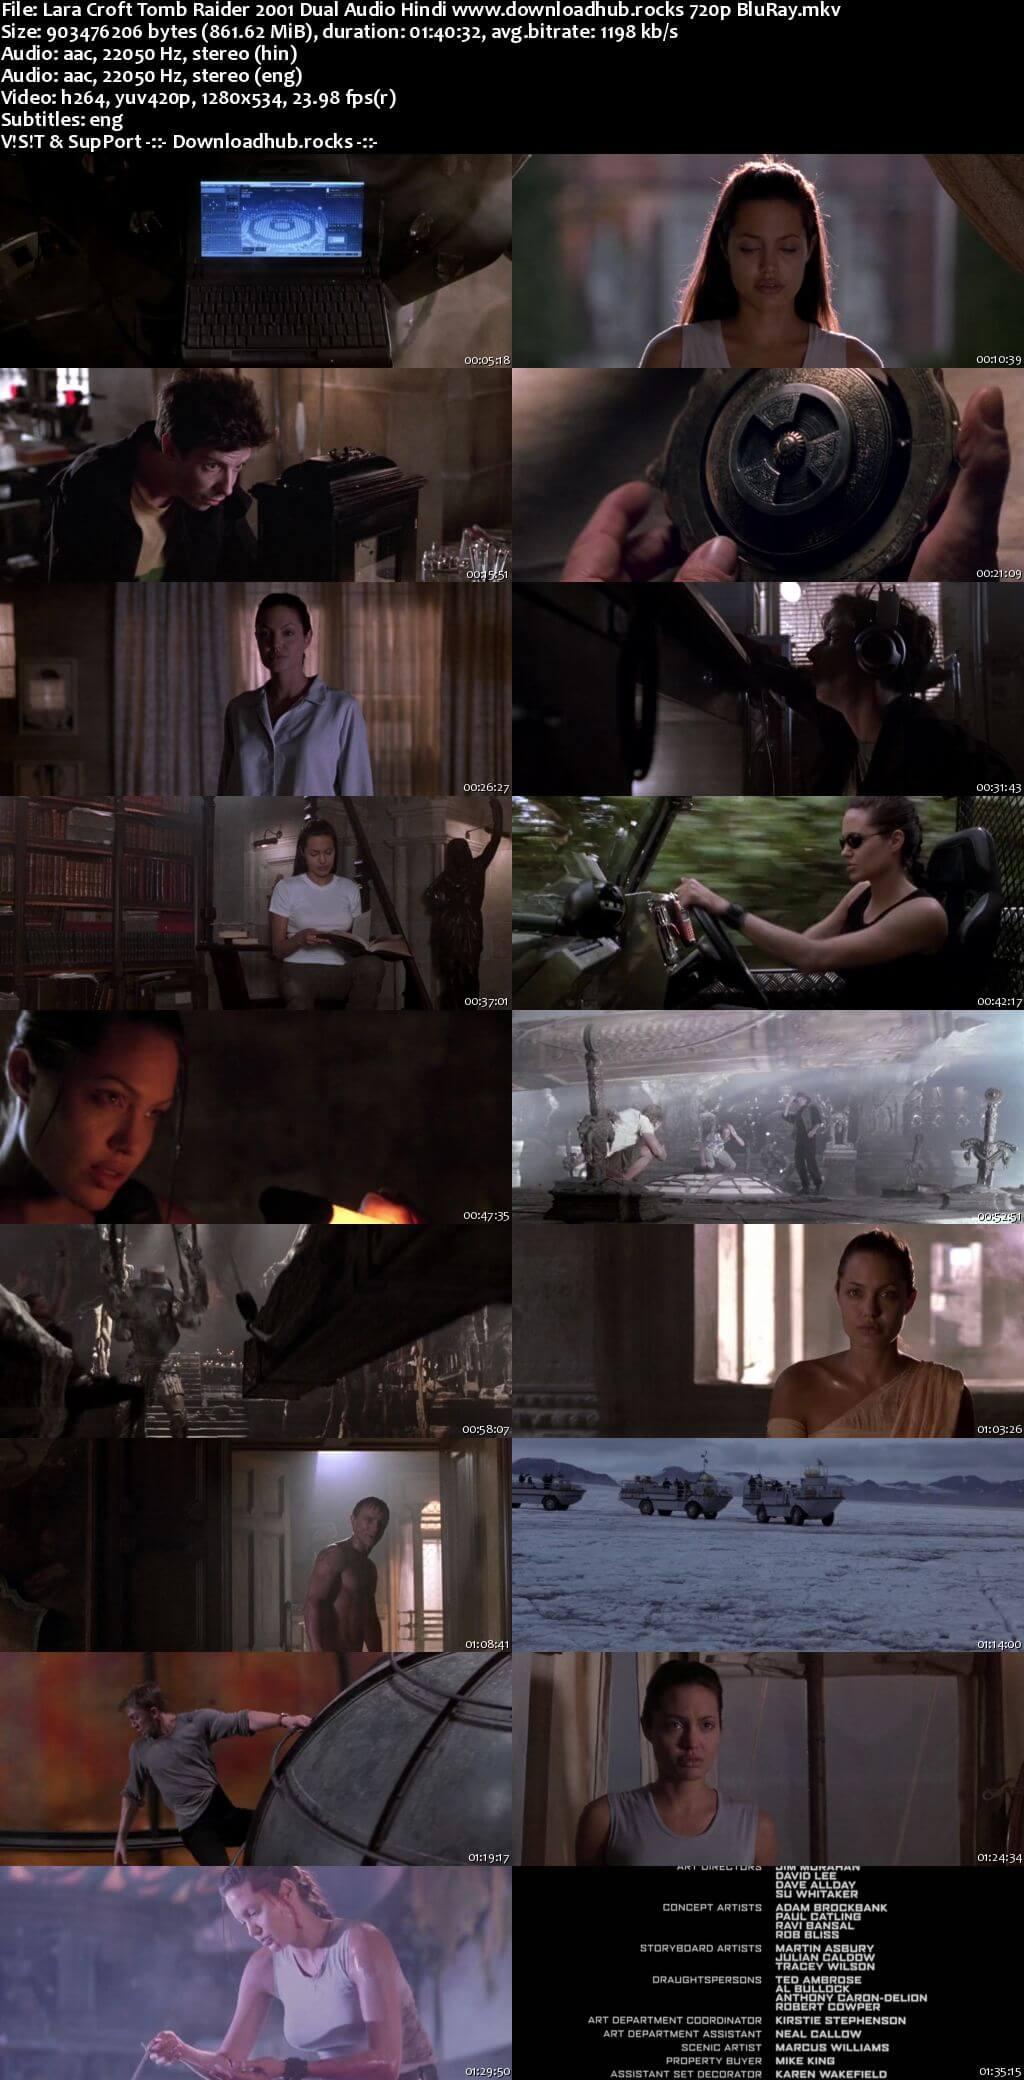 Lara Croft Tomb Raider 2001 Hindi Dual Audio 720p BluRay ESubs